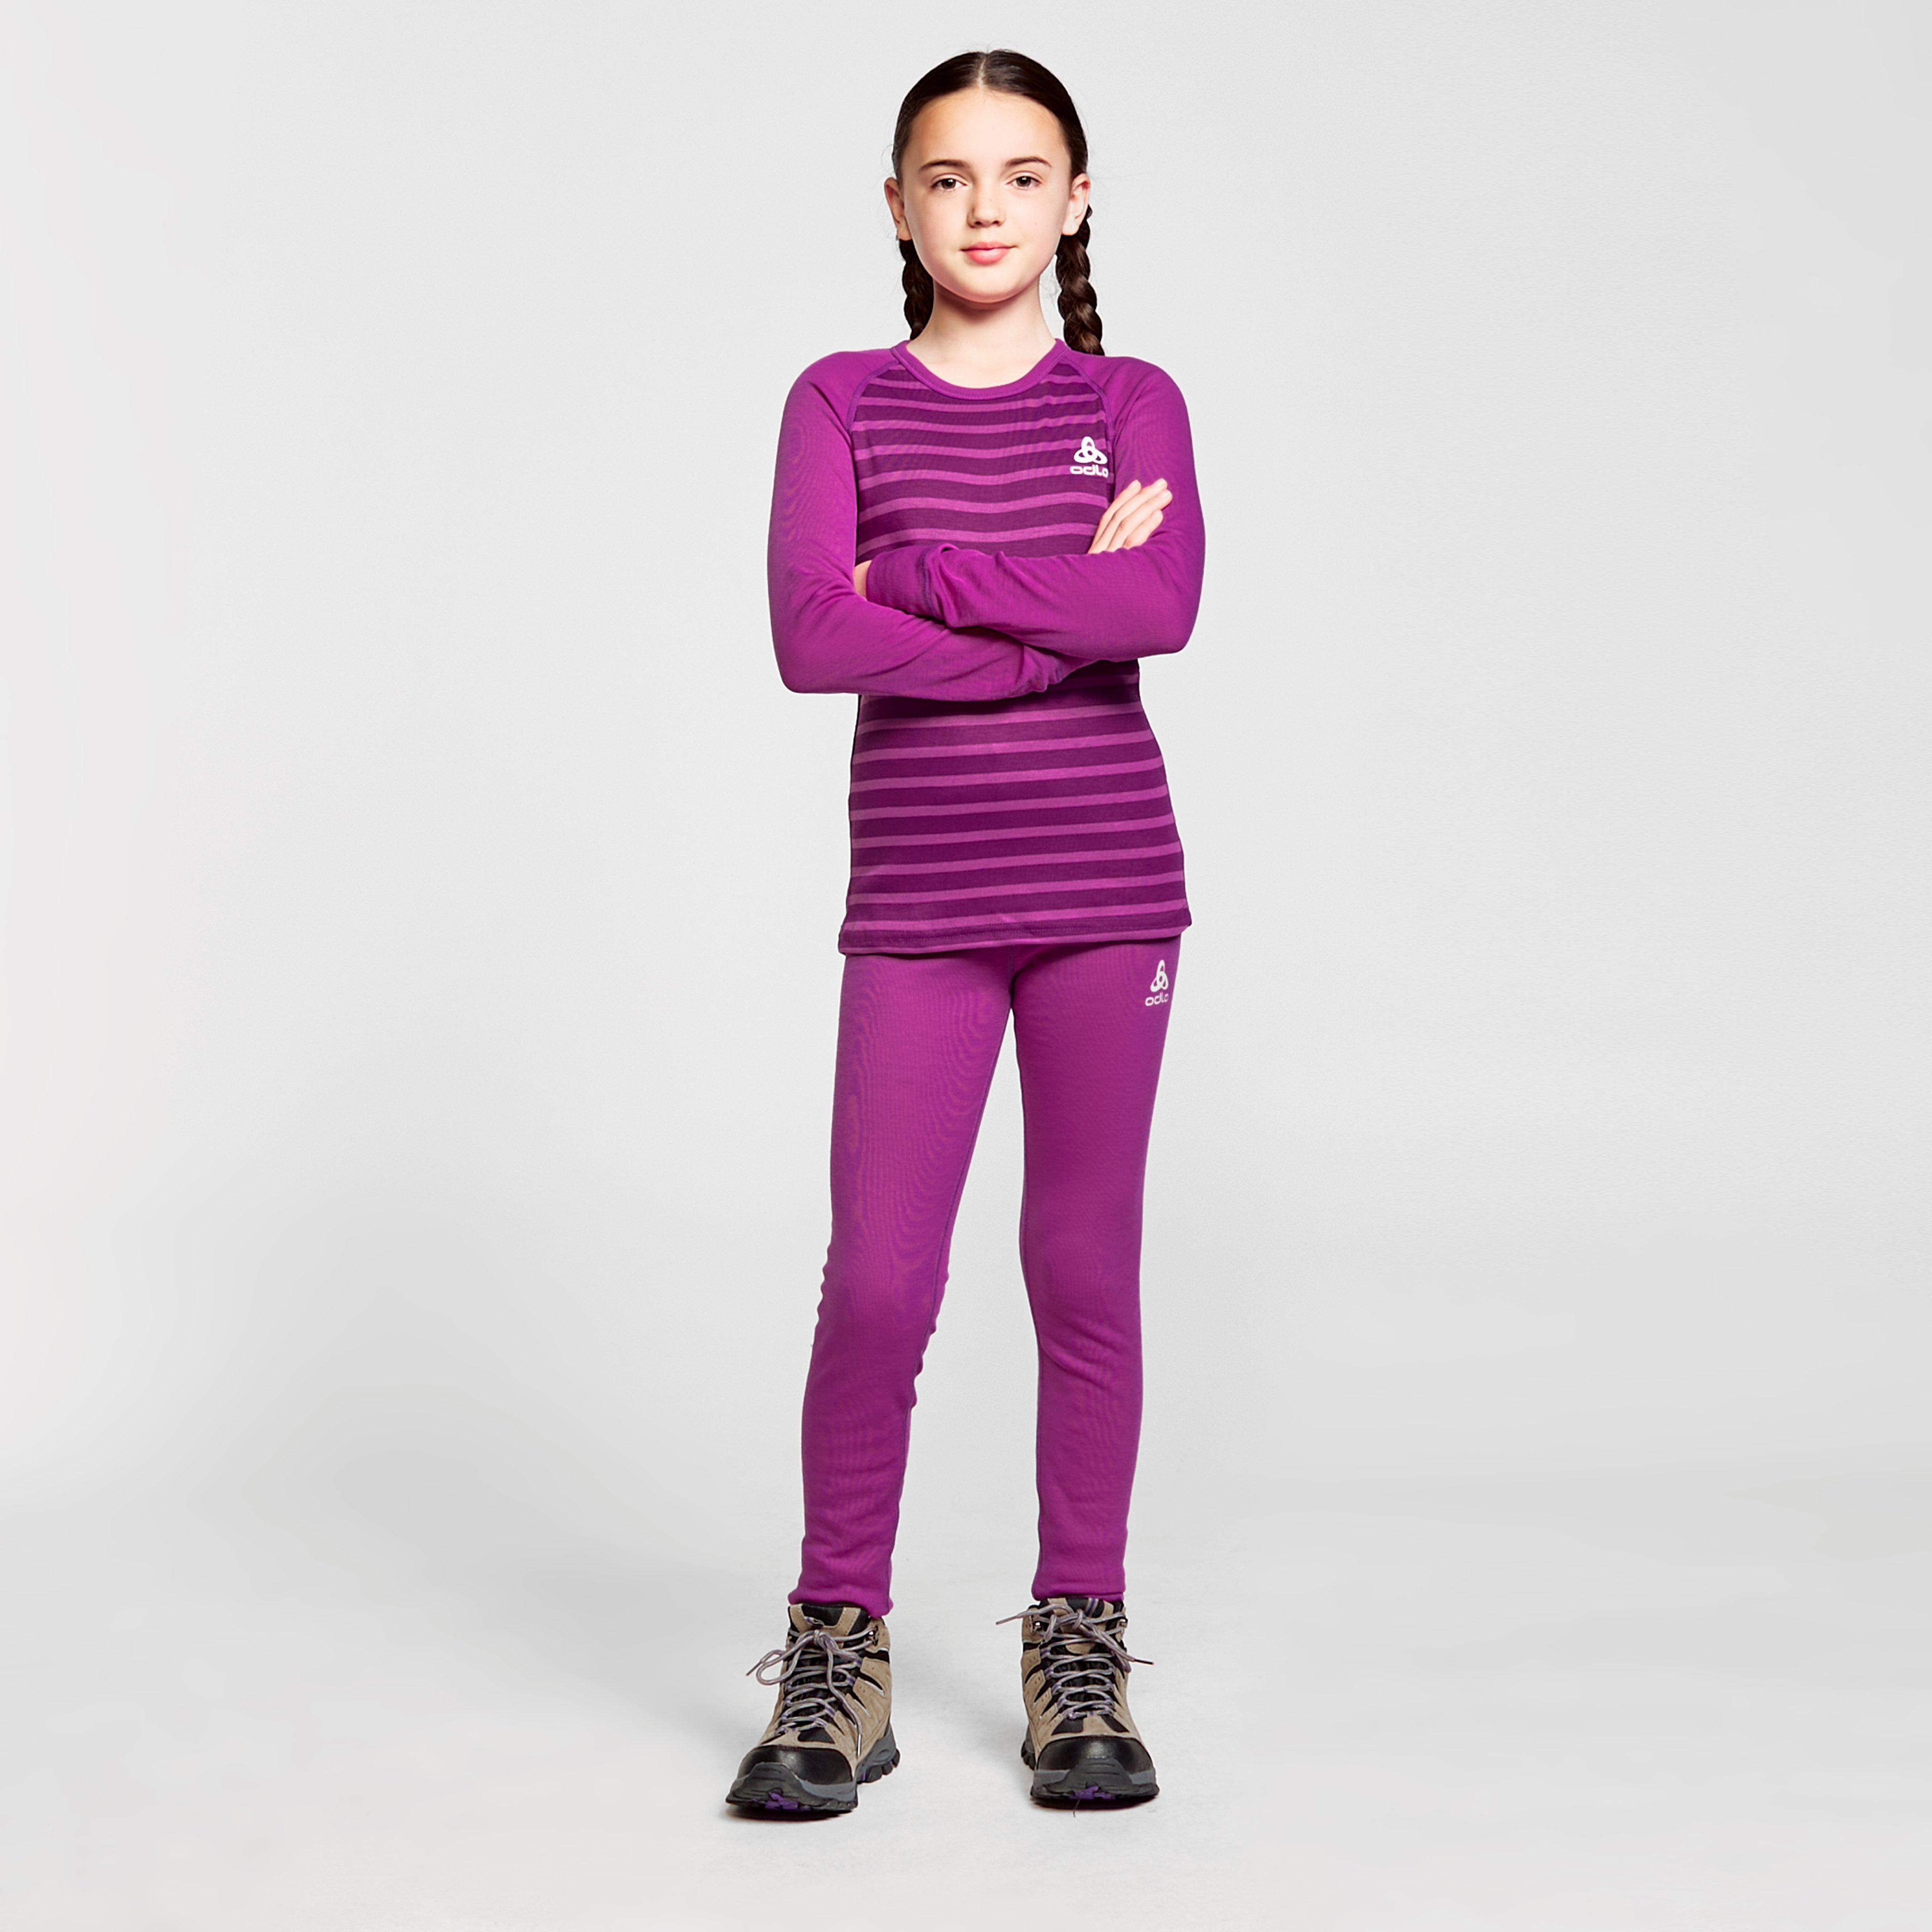 Odlo Kids' Active Warm Eco Baselayer Set - Pink/Pur, Pink